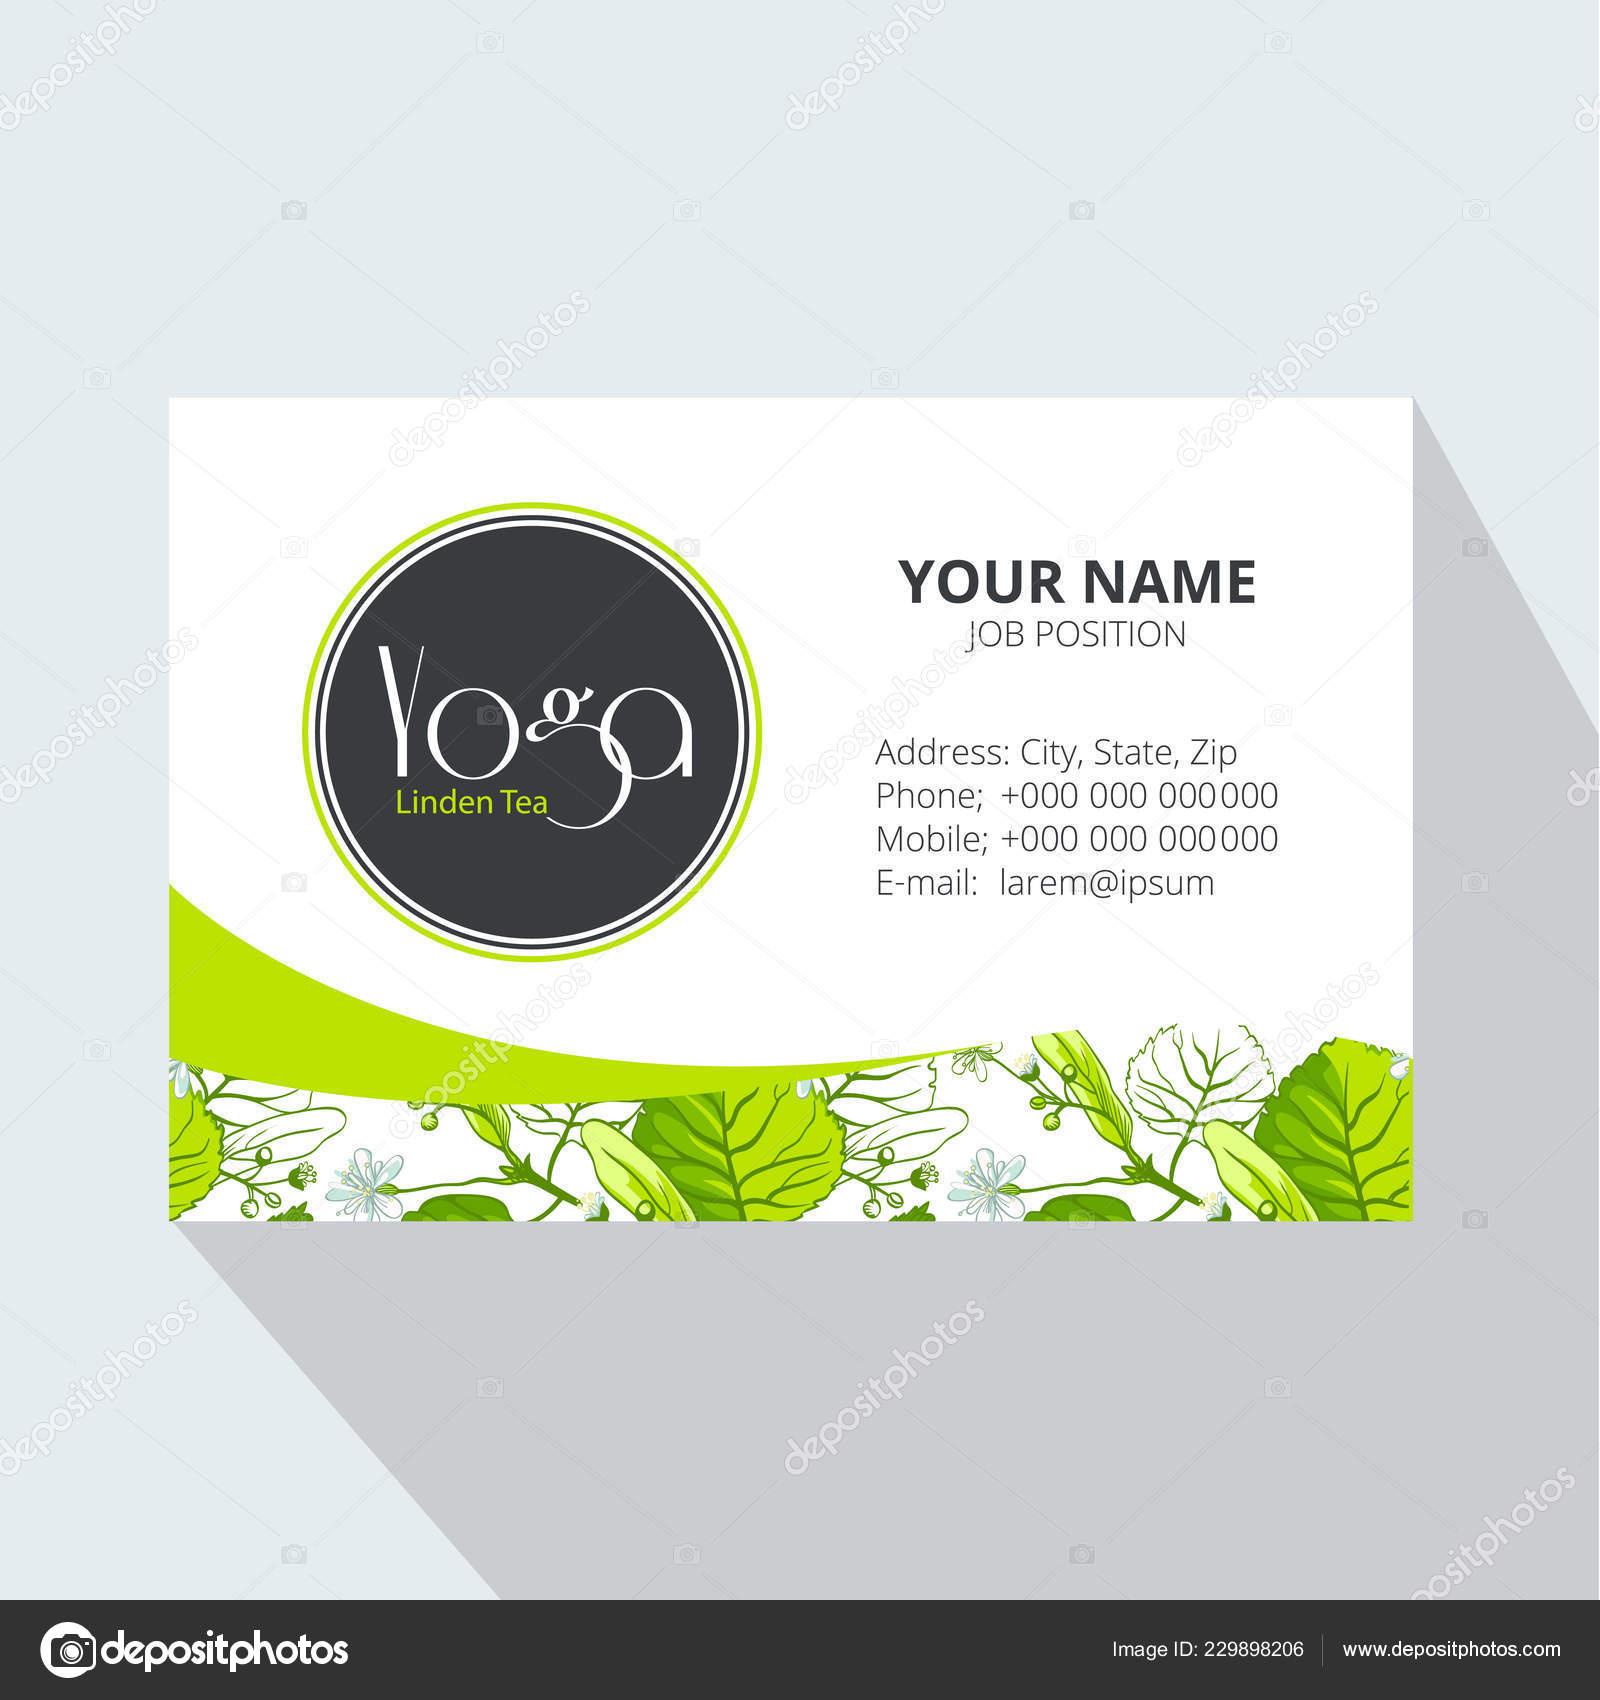 Yoga Linden Tea Corporate Business Card Linden Leaves Flowers Tea Stock Vector C Marina Eisymant 229898206